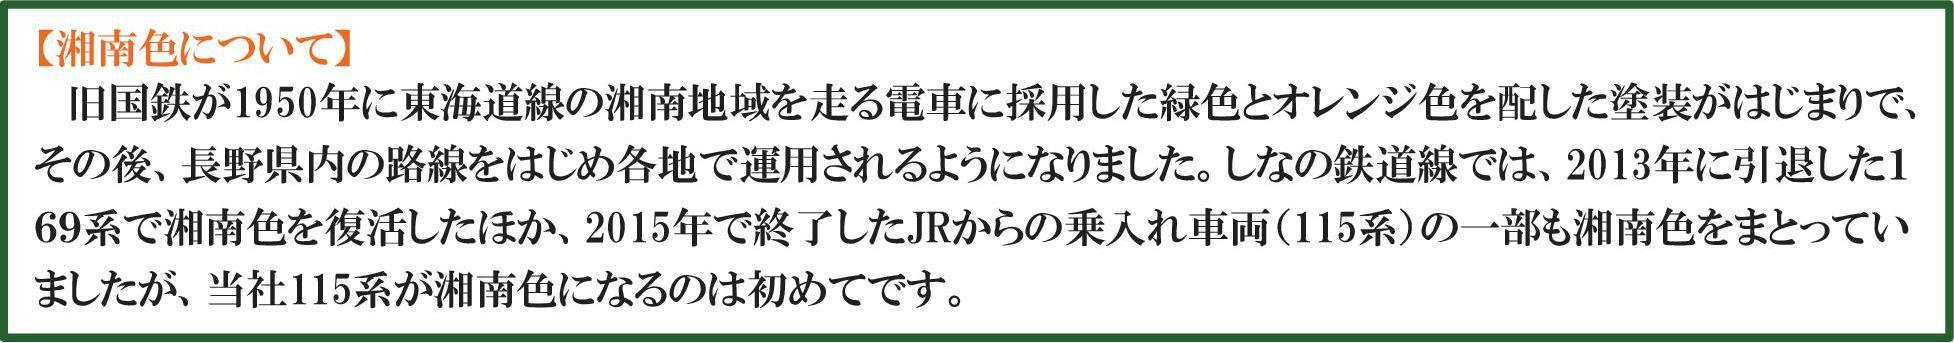 20170707_syonan_tabi.jpg